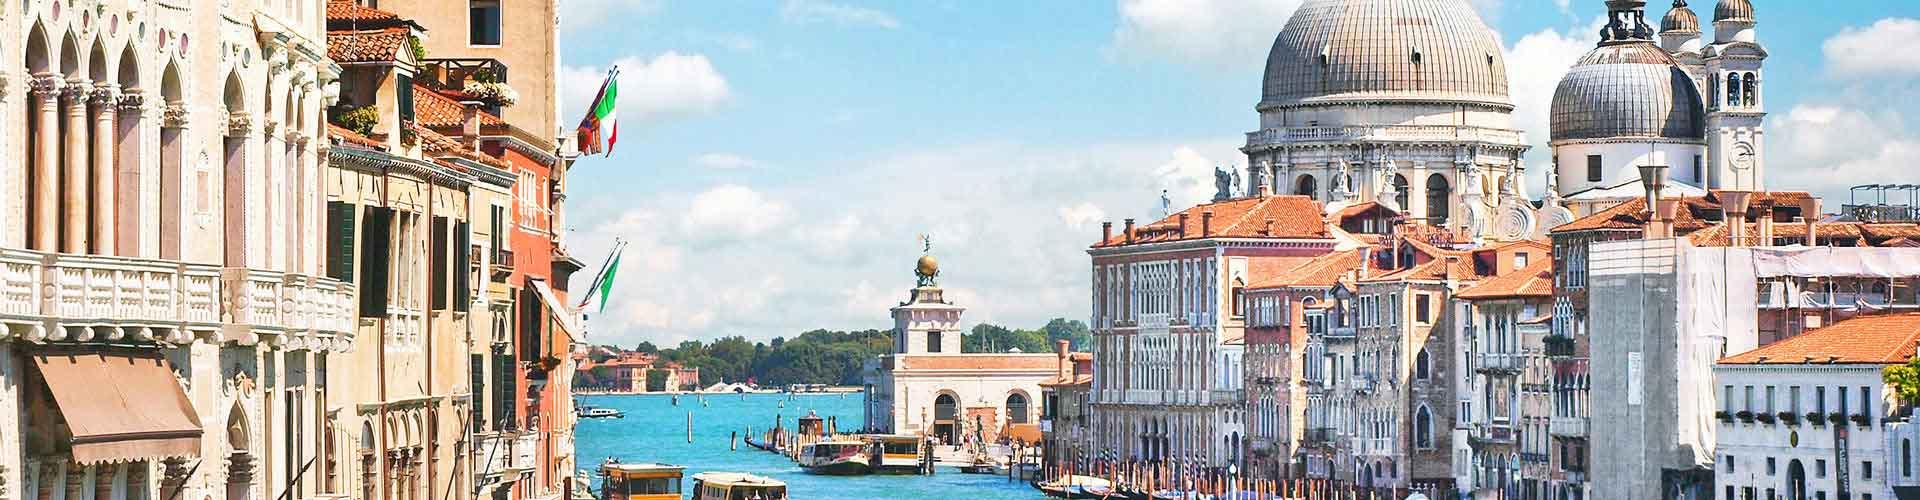 Venecia - Apartamentos cerca a Estación de tren de Venecia Santa Lucia . Mapas de Venecia, Fotos y comentarios de cada Apartamento en Venecia.